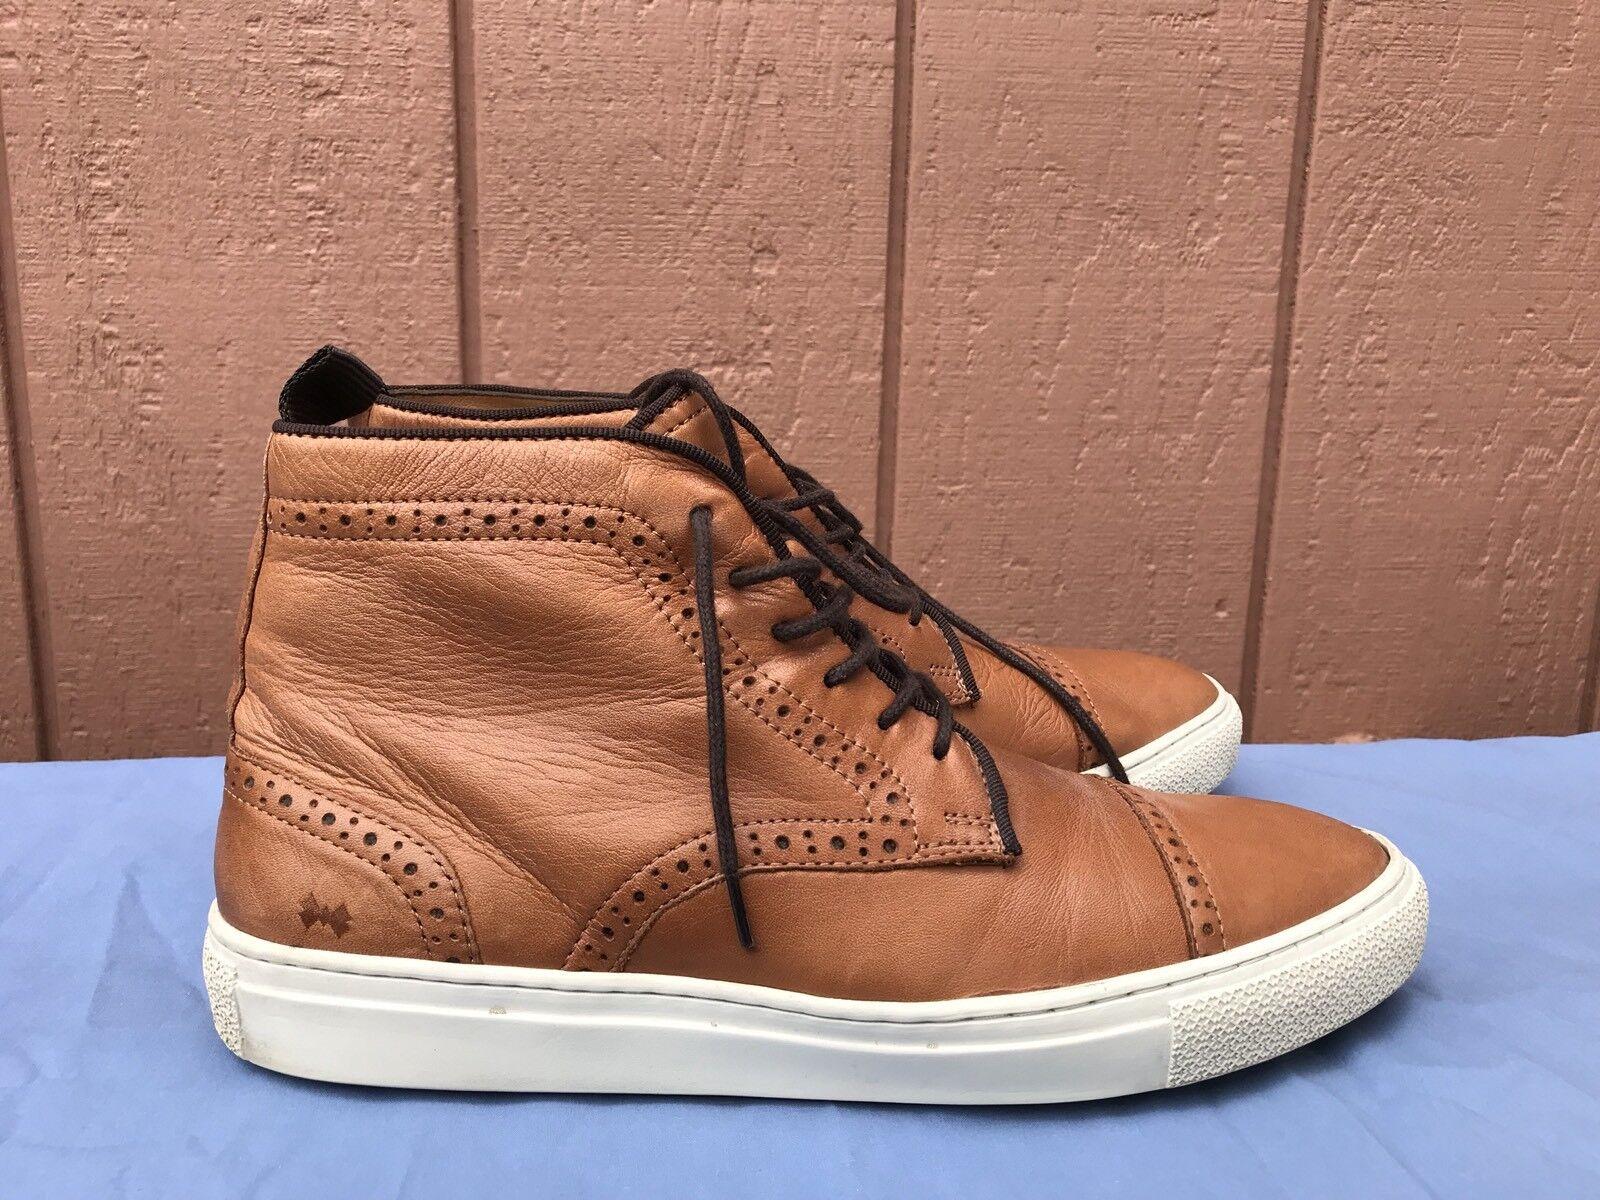 EUC RARE Mr B's US 9.5 braun Leather Cap toe Brogue Ankle Lace Up Stiefel schuhe A4